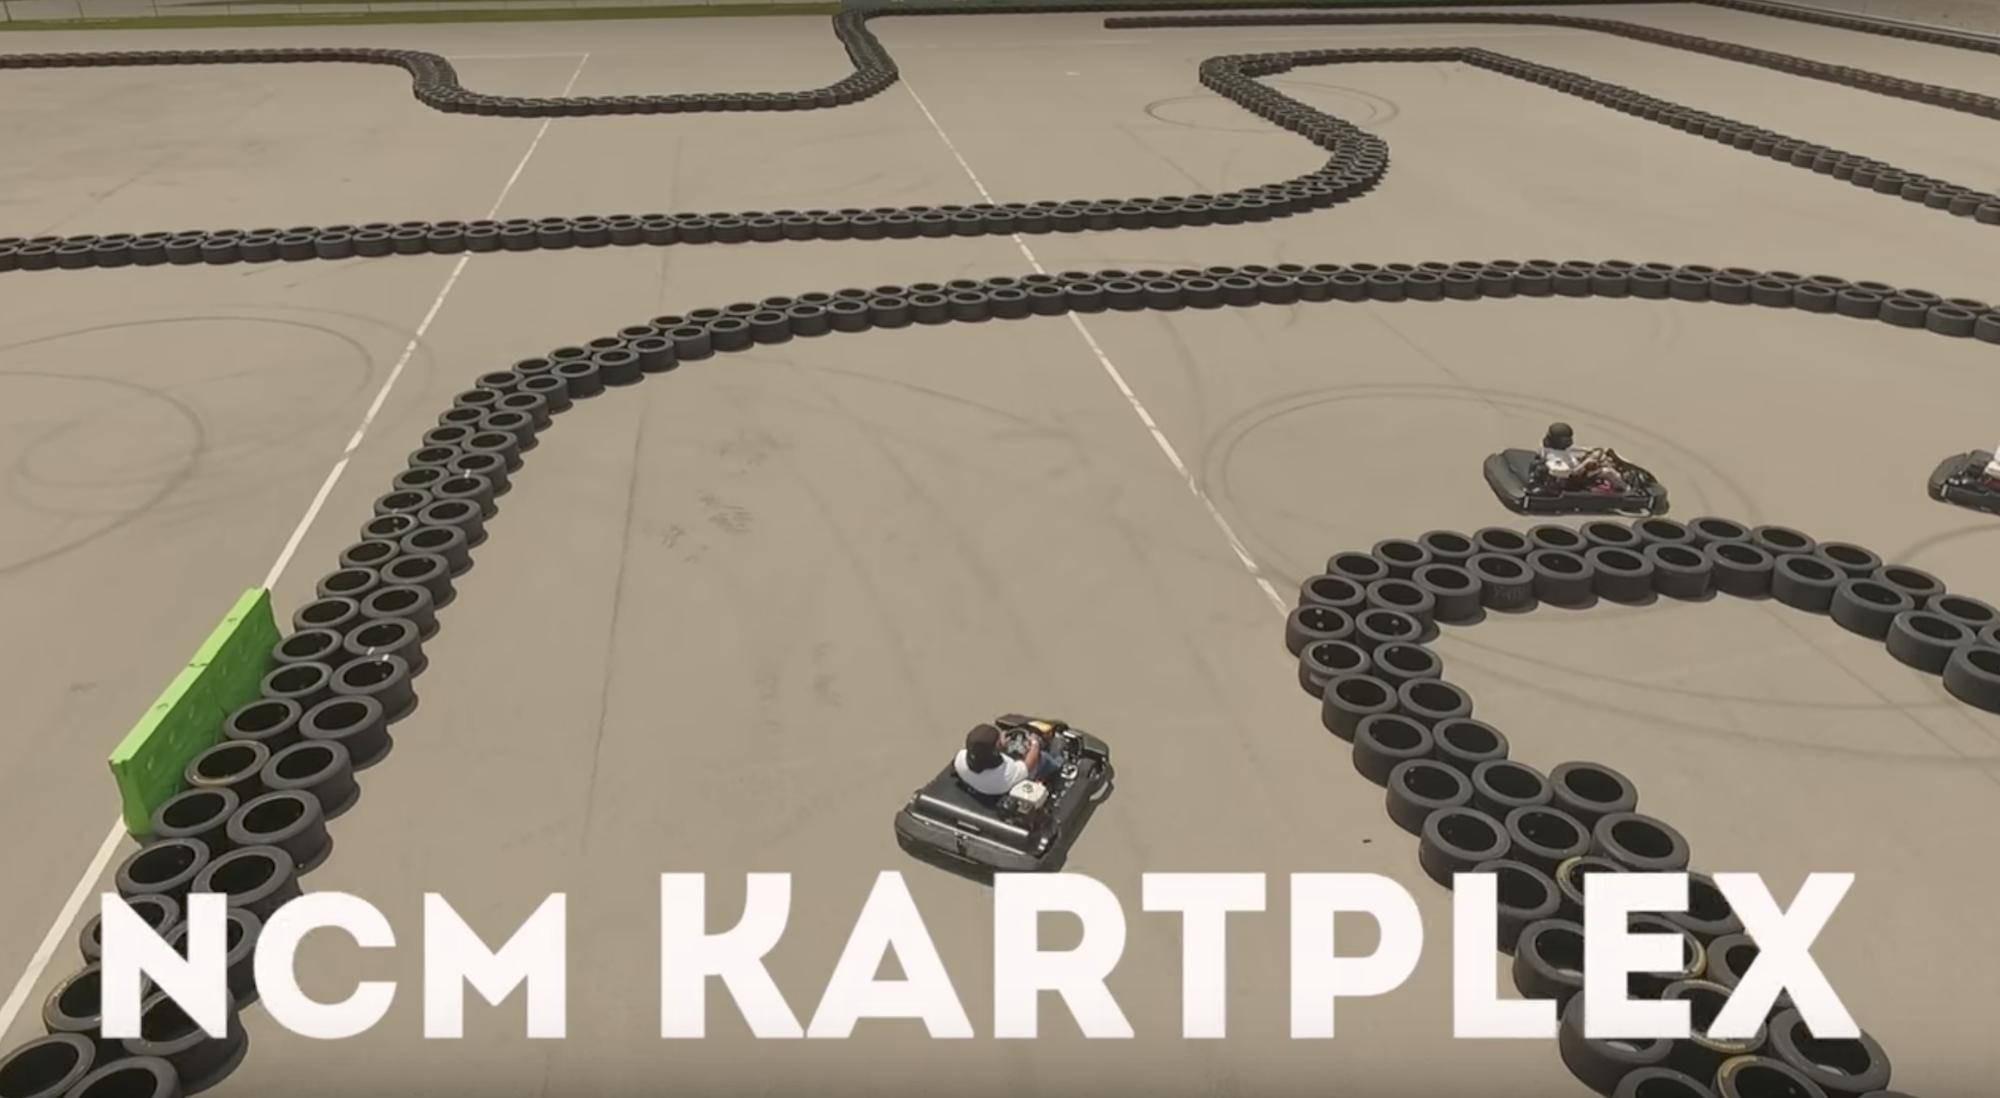 Carolina Motorsports Park >> Check Out the National Corvette Museum's Kartplex Go-Kart ...